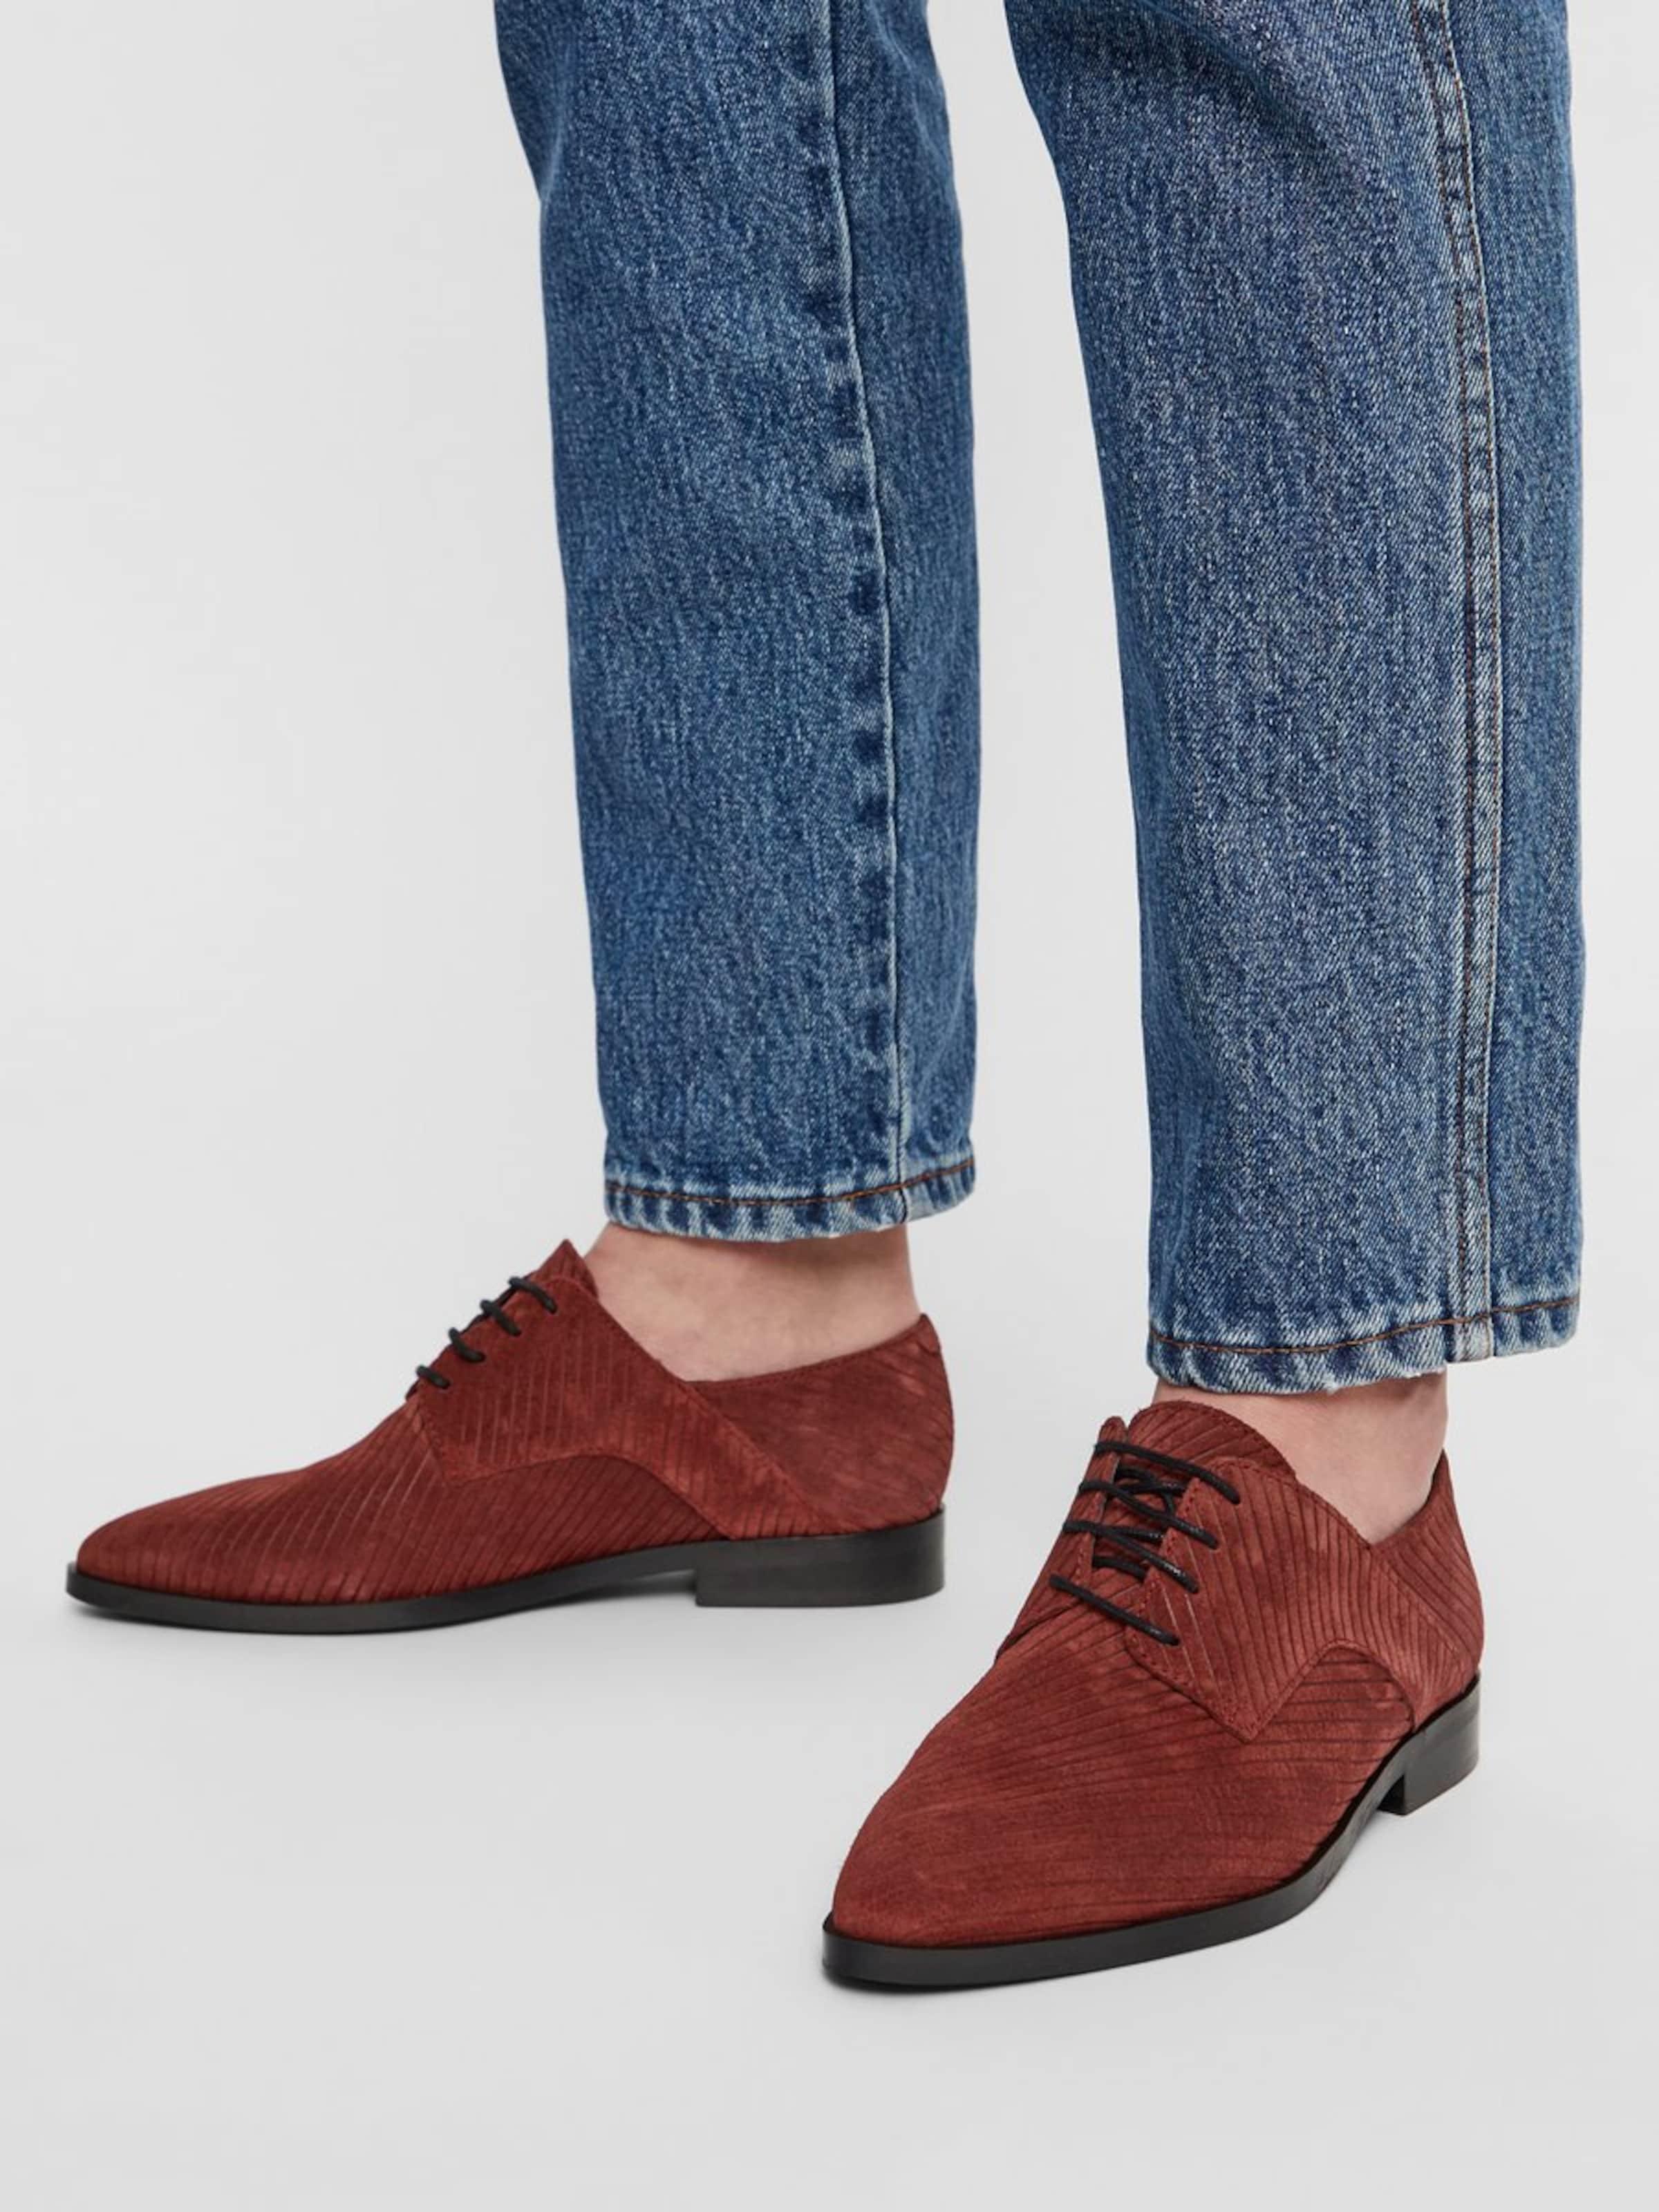 En Chaussure Lacets Rouille À Bianco Rouge yIYbf6gv7